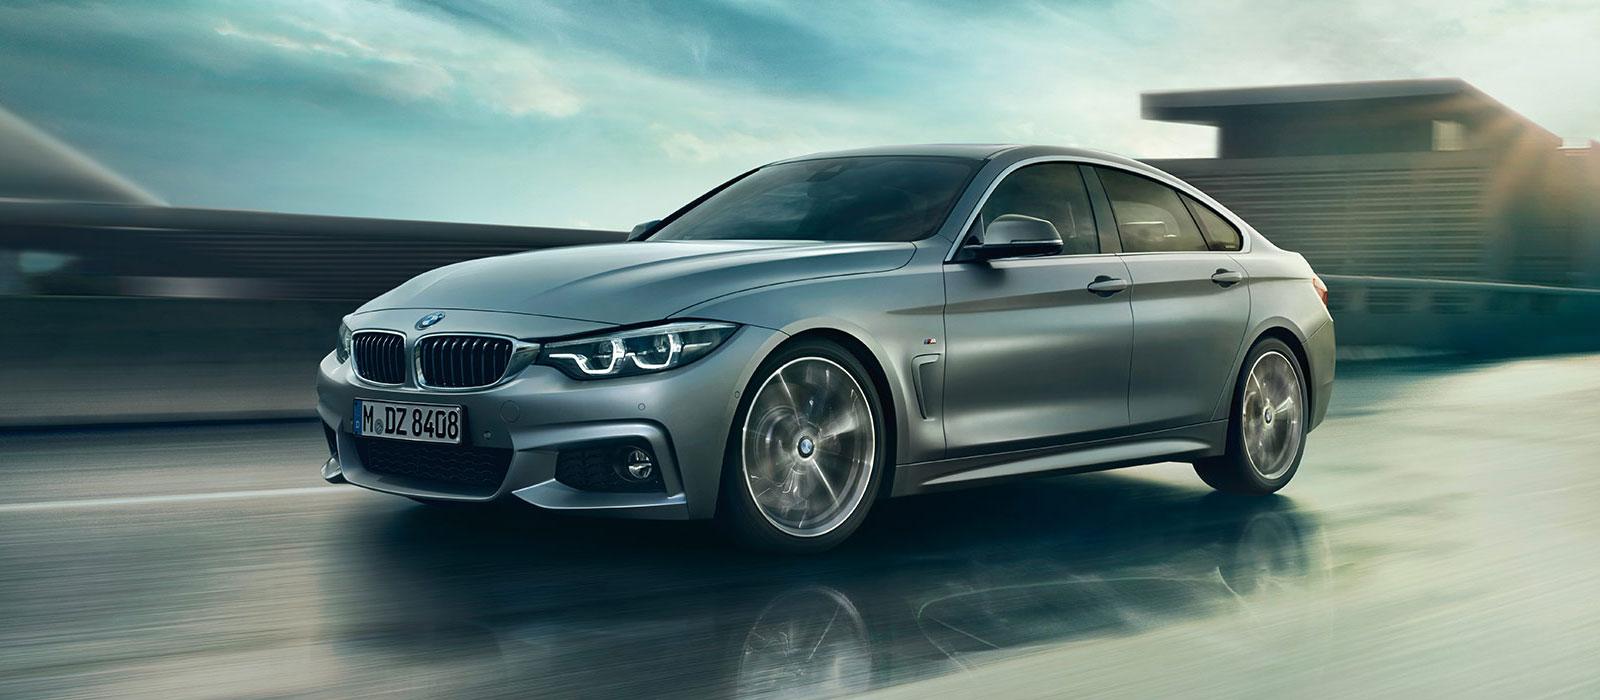 BMW Wagner - BMW 4er Gran Coupé Angebot